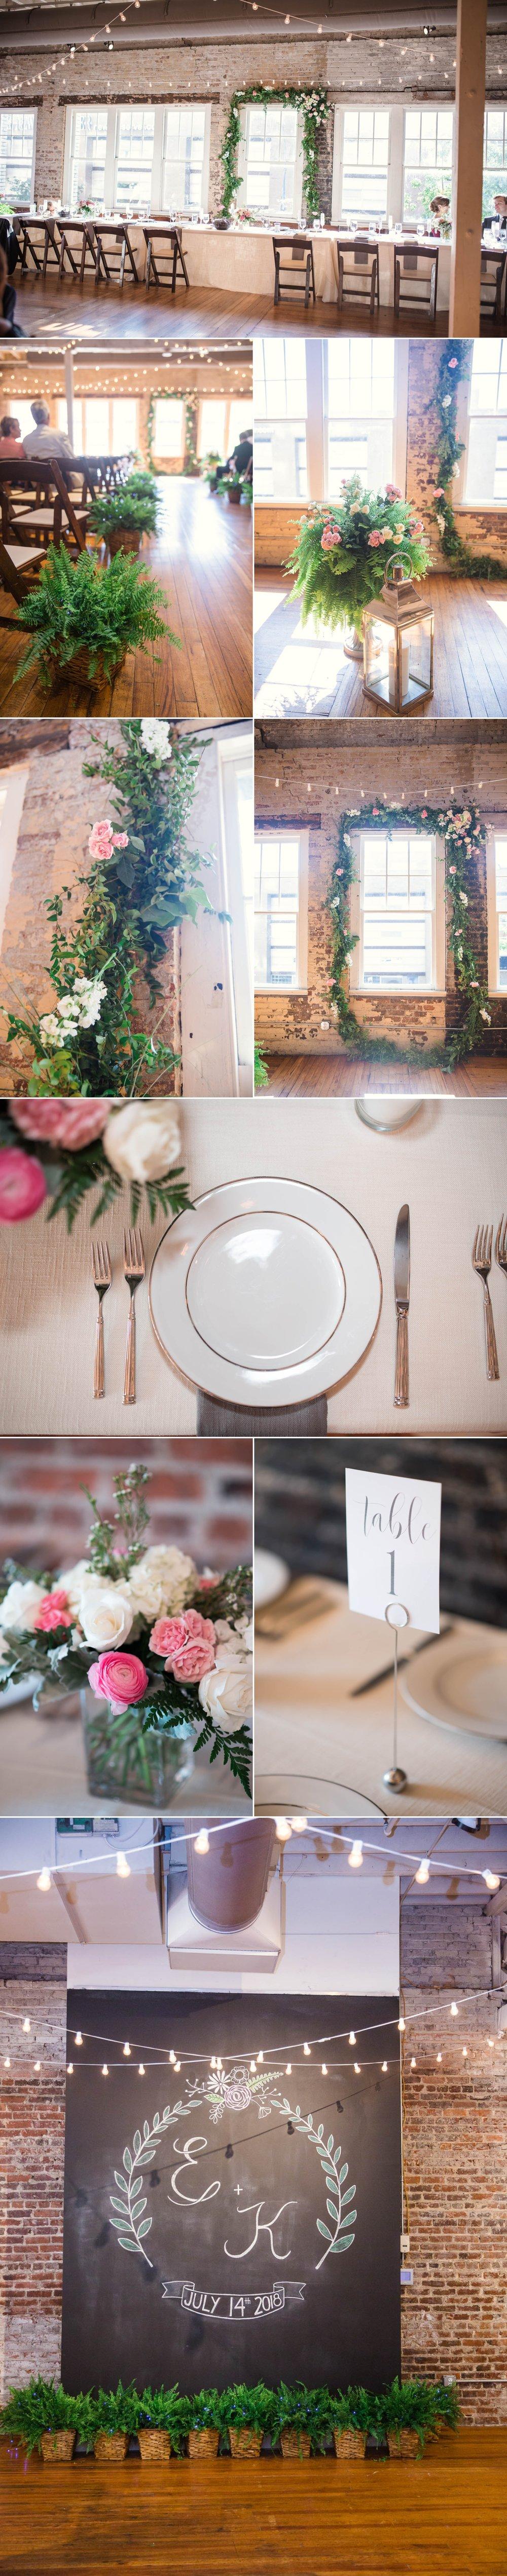 Elizabeth + Kane - Wedding at the Stockroom at 230 - Raleigh North Carolina Wedding Photographer 5.jpg